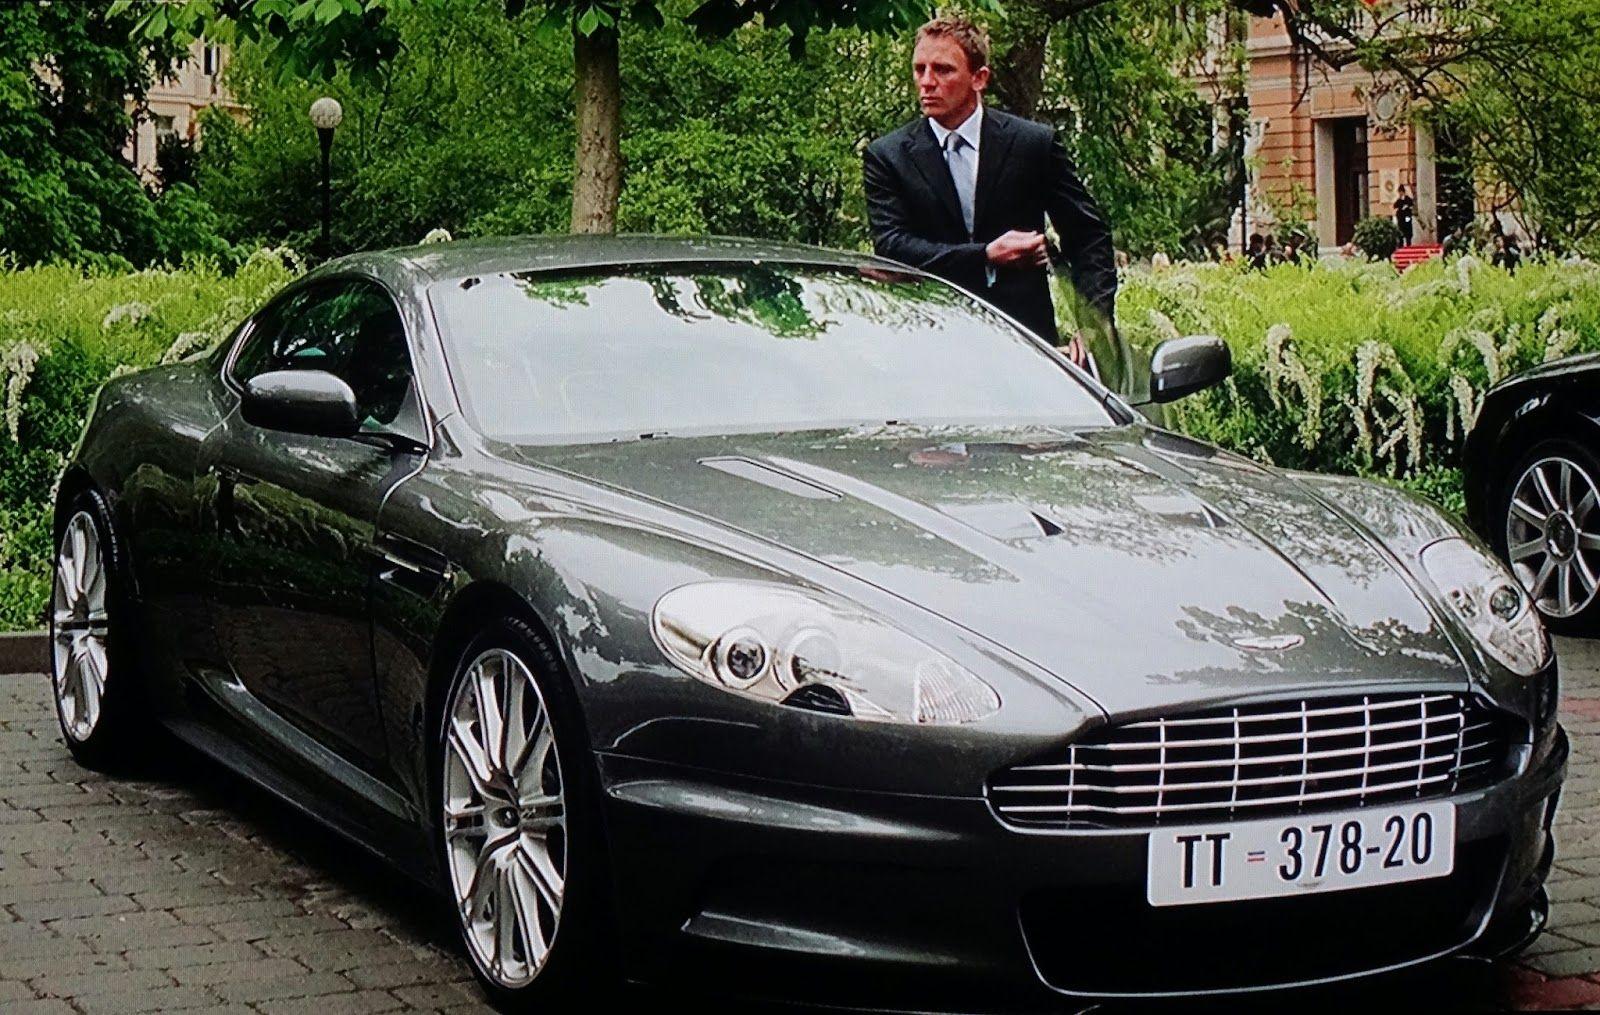 belle voiture 007 casino royale